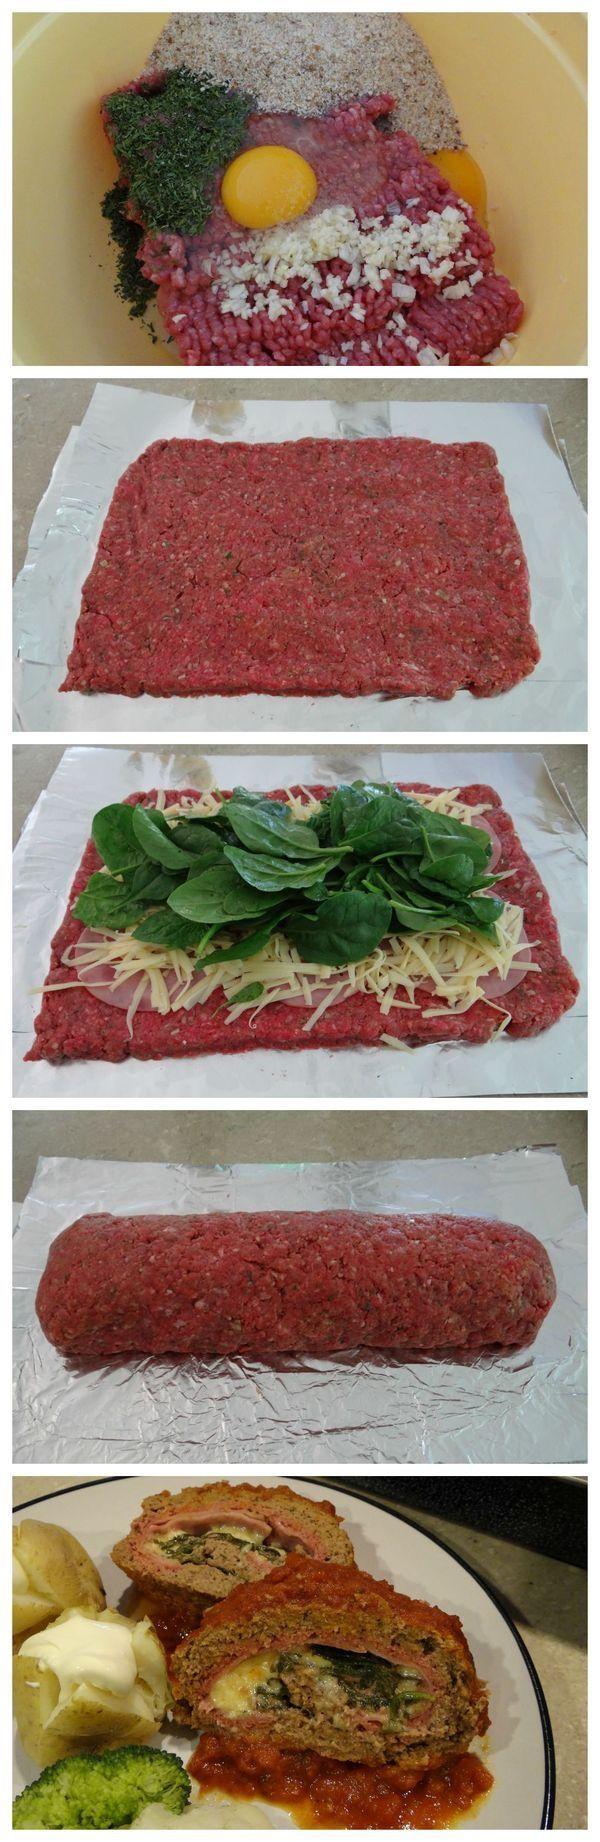 Rollo de carne  Molida con espinacas,queso,jamón huevo,especias pan molido etc..